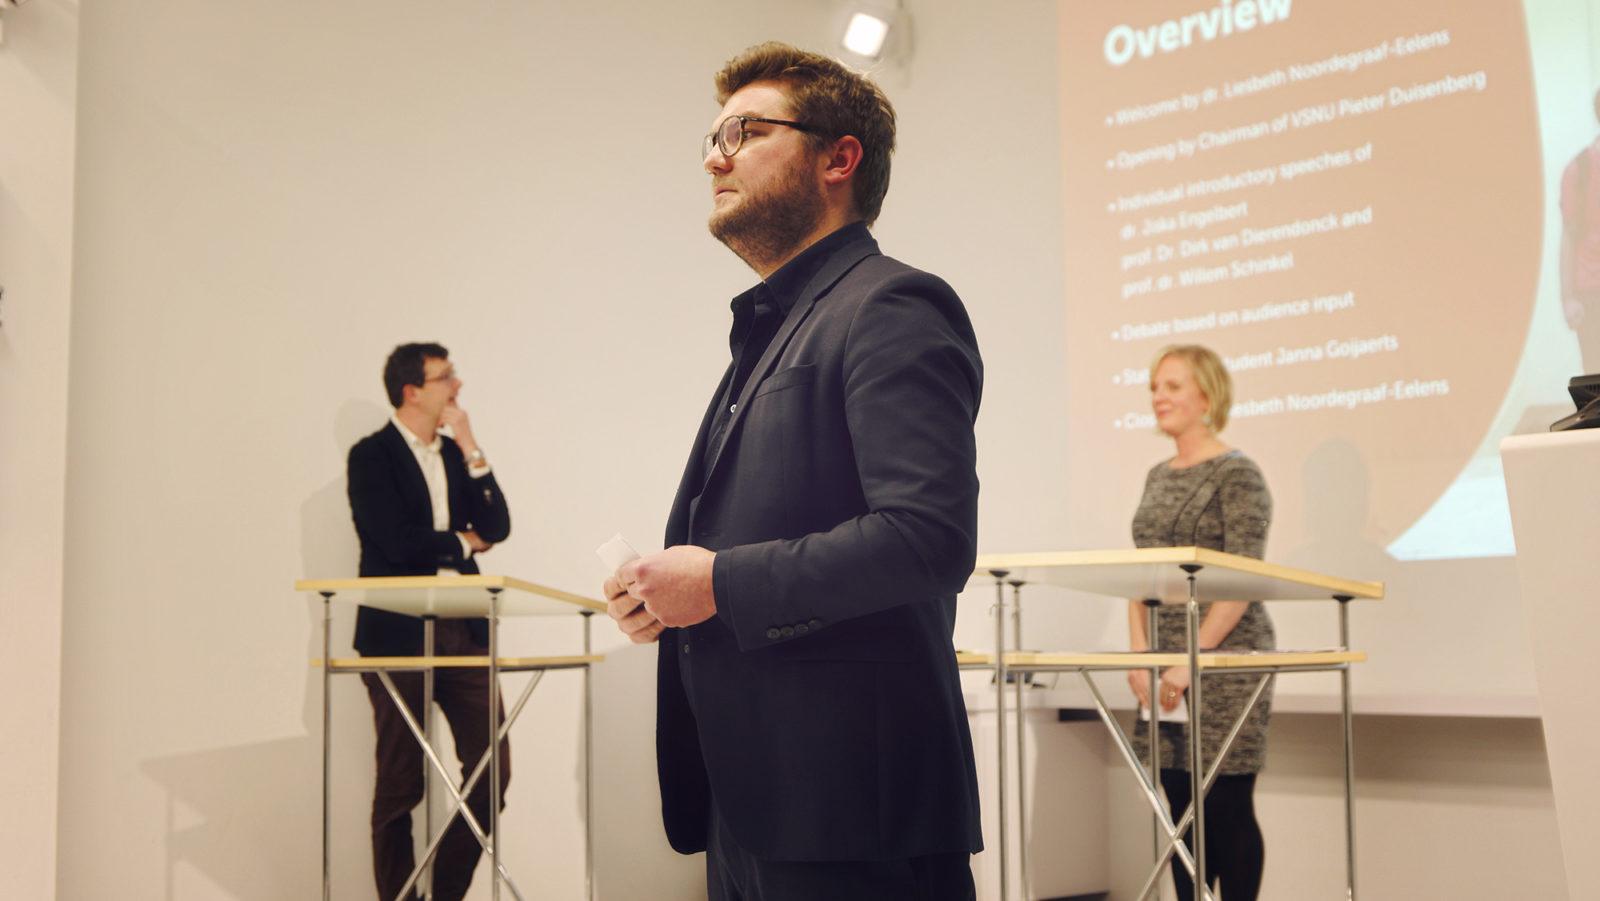 Future of the university debat